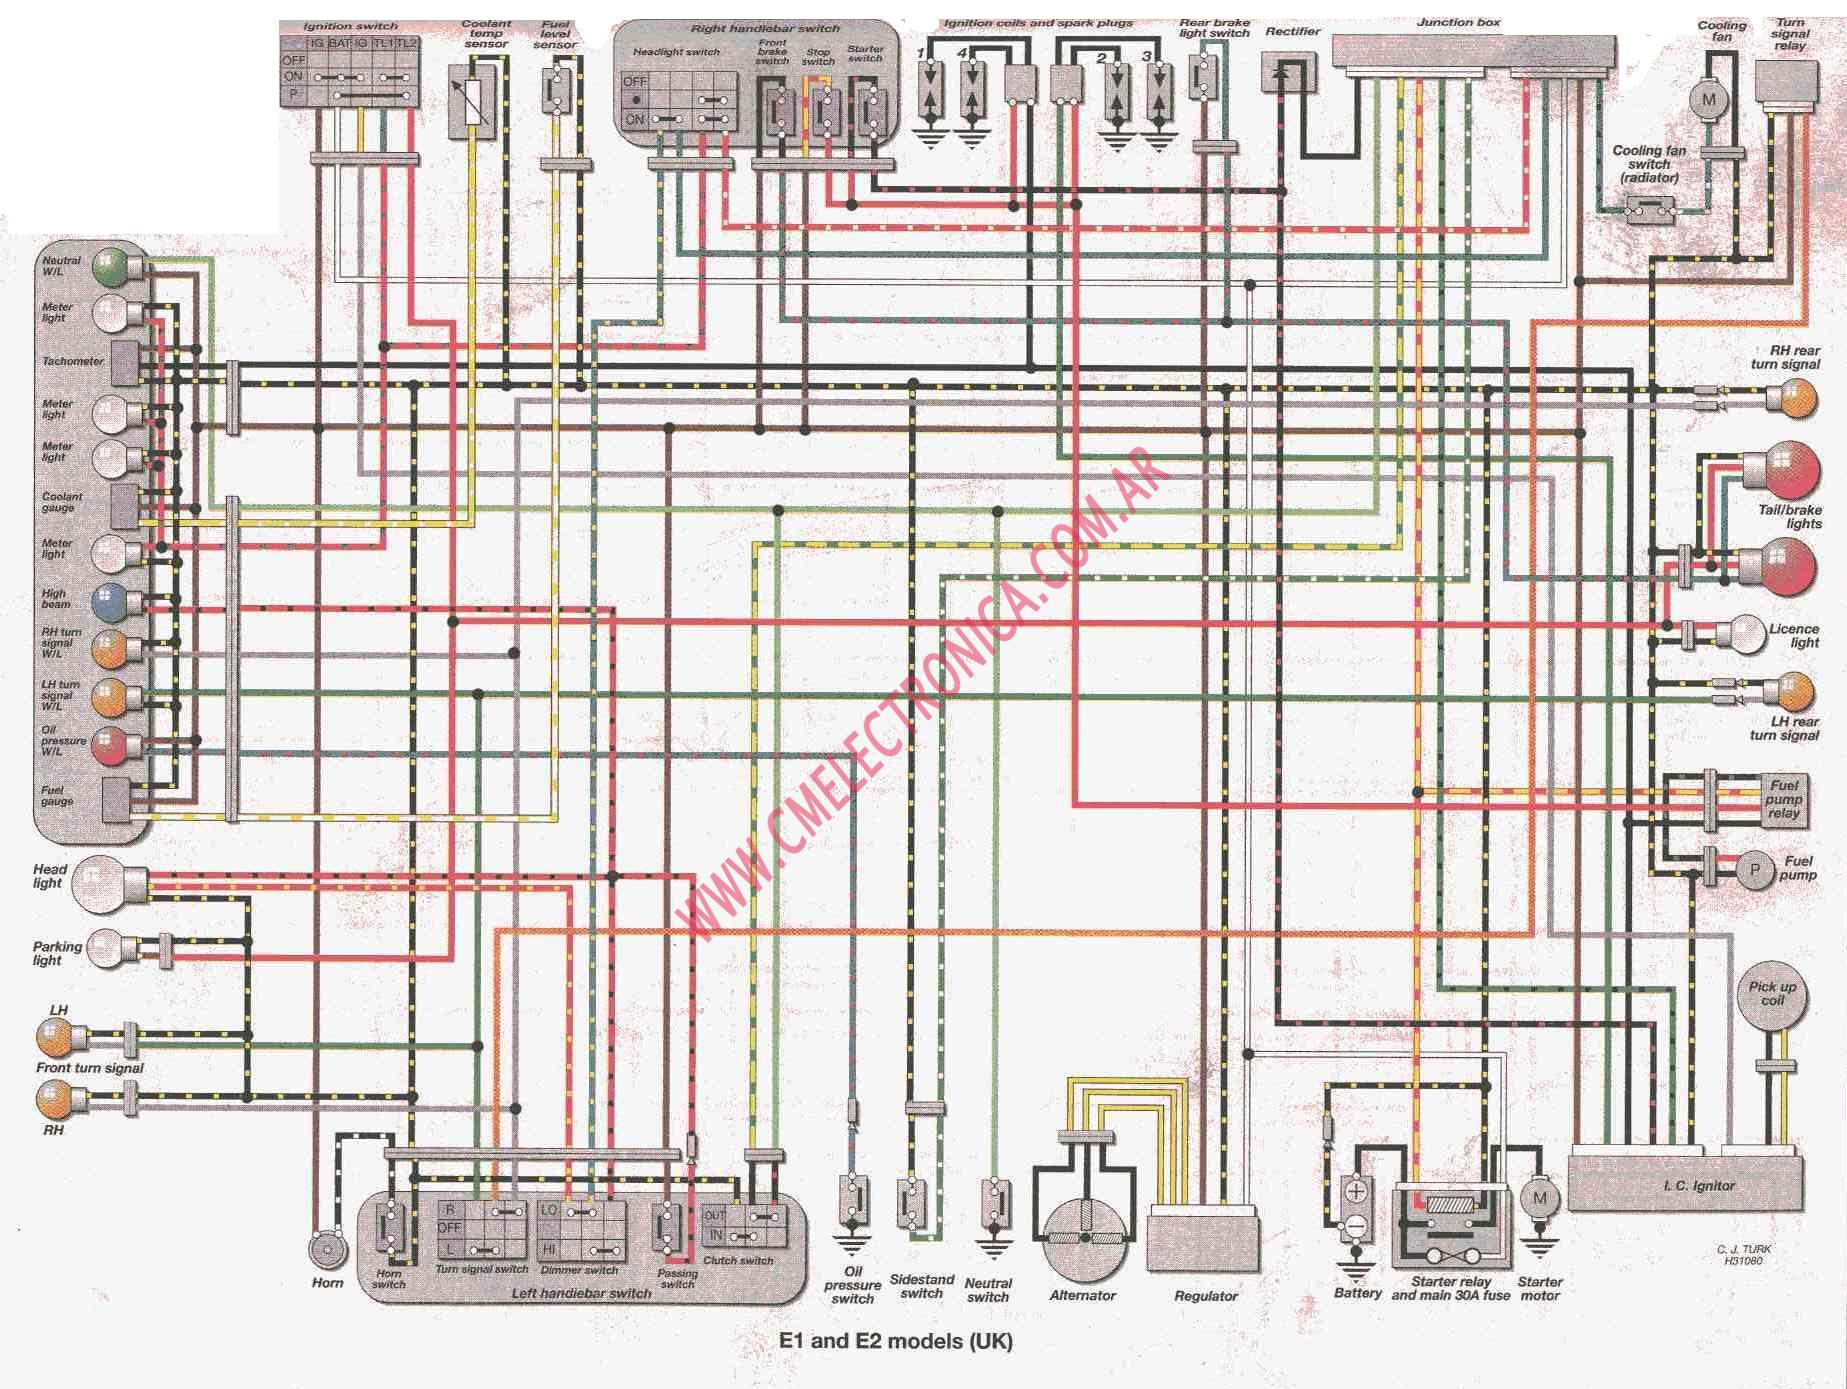 kawasaki zzr600_93 98?resize\\\\\\\\\\\\\\d665%2C500 yamaha mio sporty wiring diagram pdf efcaviation com yzf600r wiring diagram at fashall.co